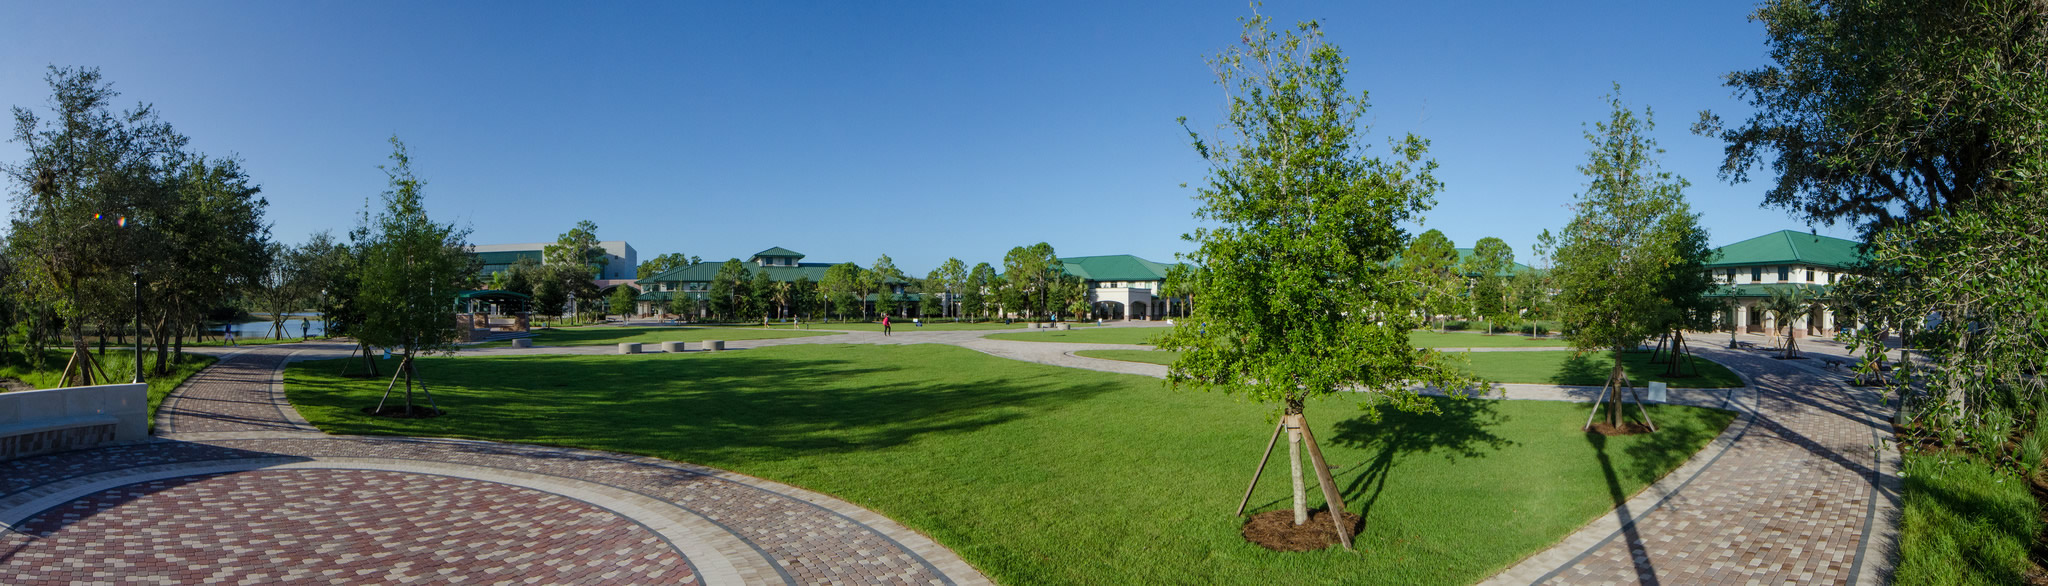 FGCU Landscape